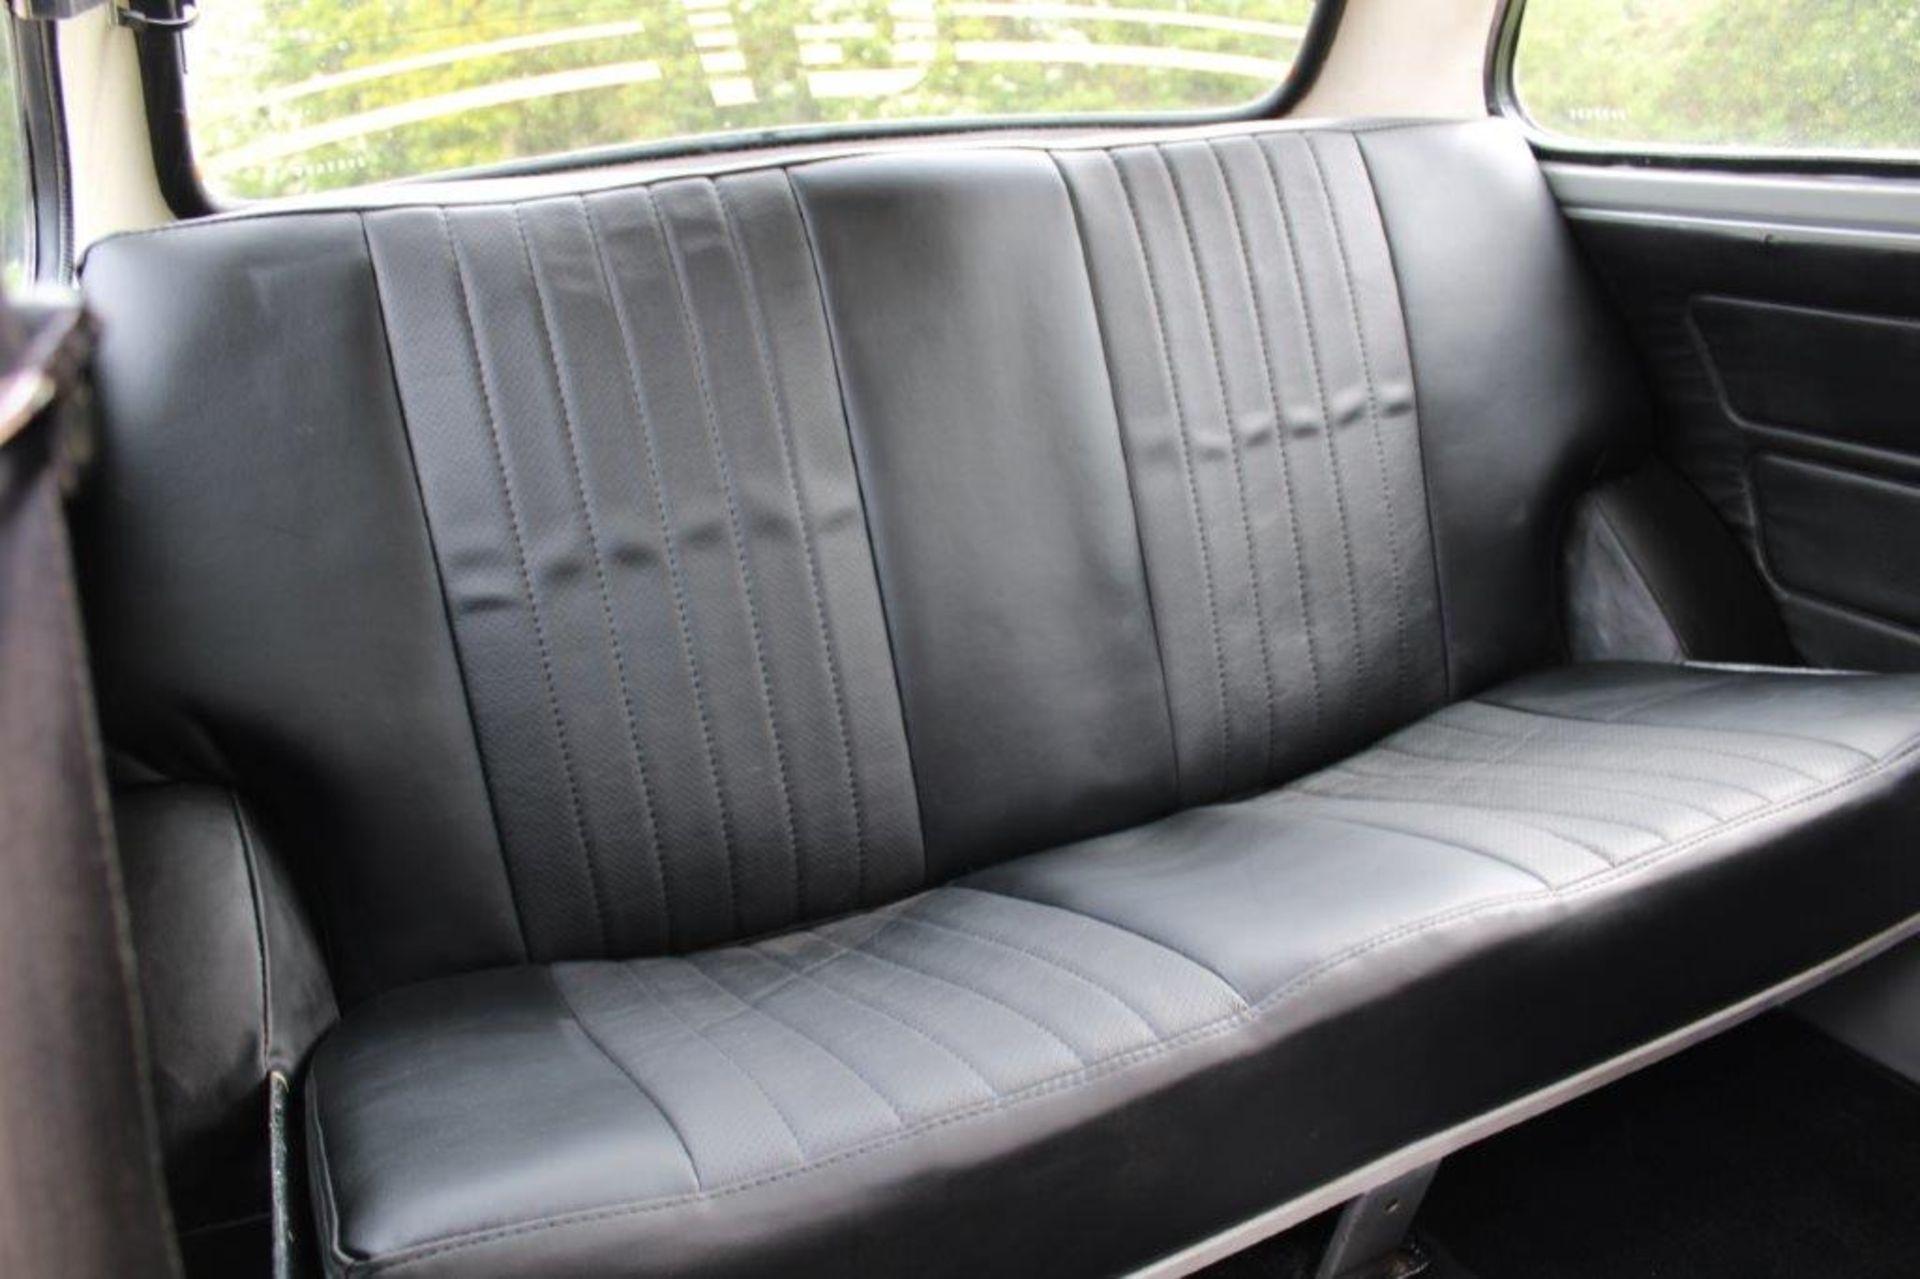 1980 Austin Morris Mini 1275 GT - Image 18 of 28